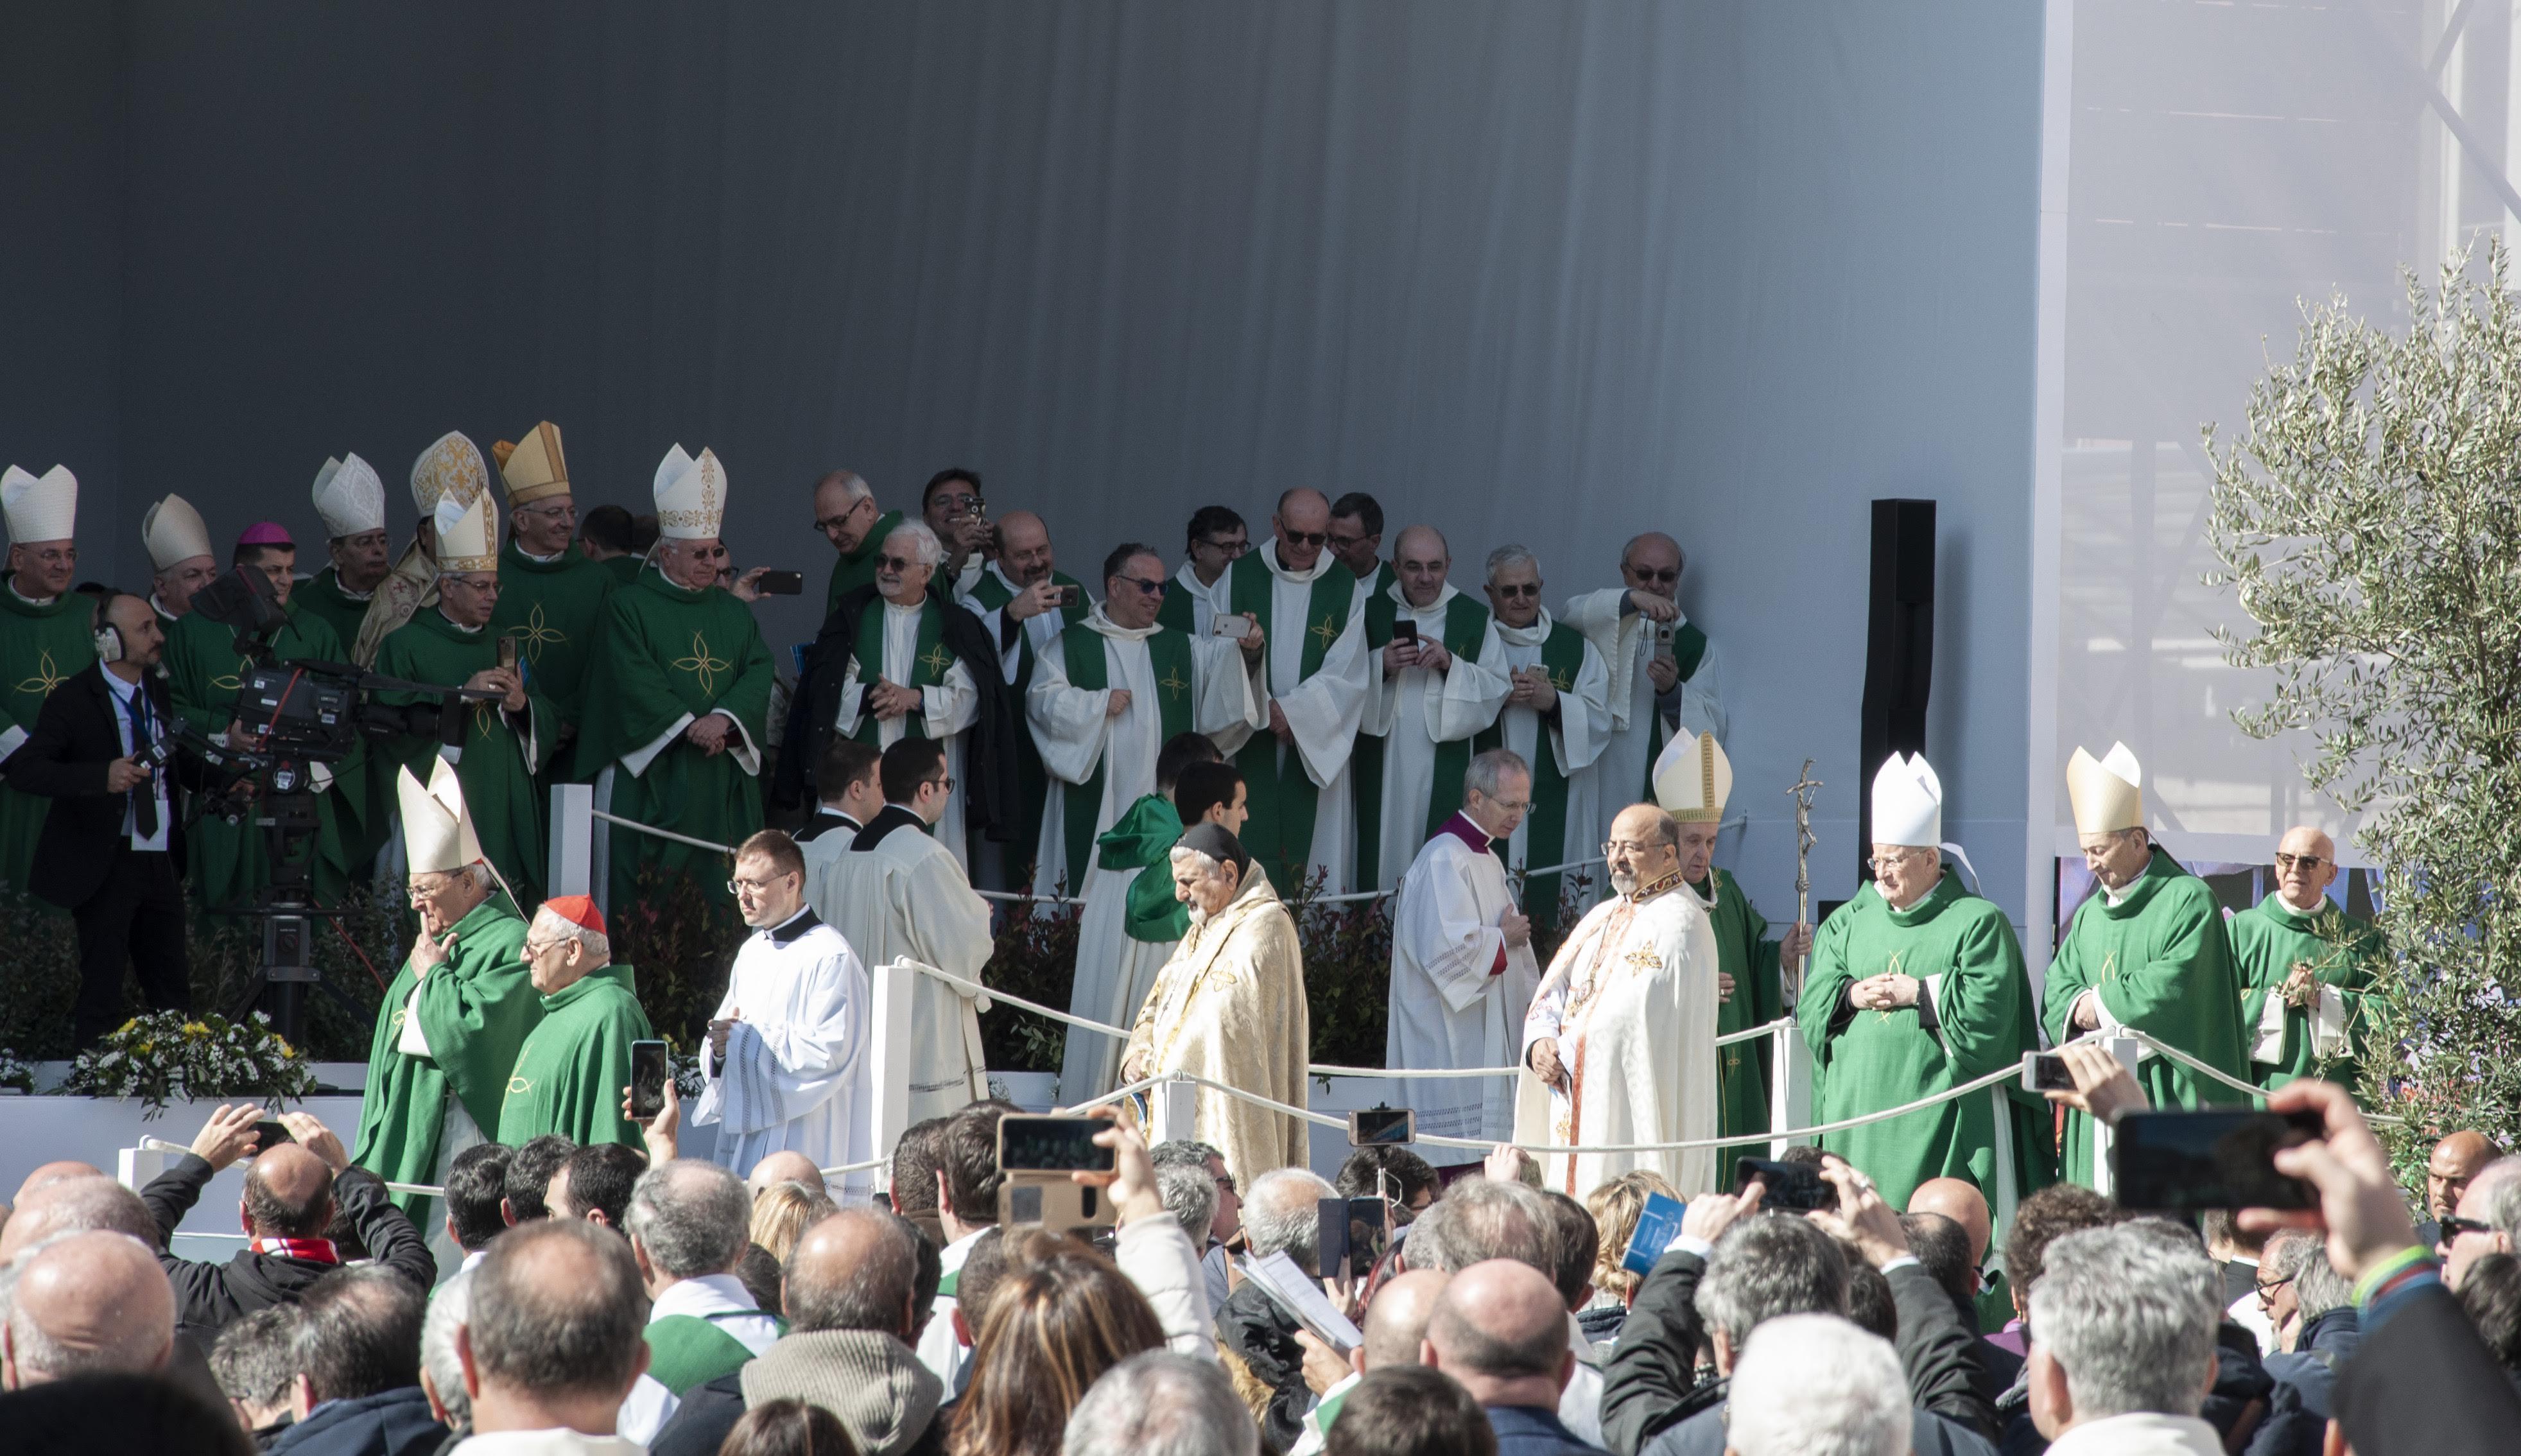 20200223 Bari Papa Francesco 100 (Copia di NXPowerLite).jpg